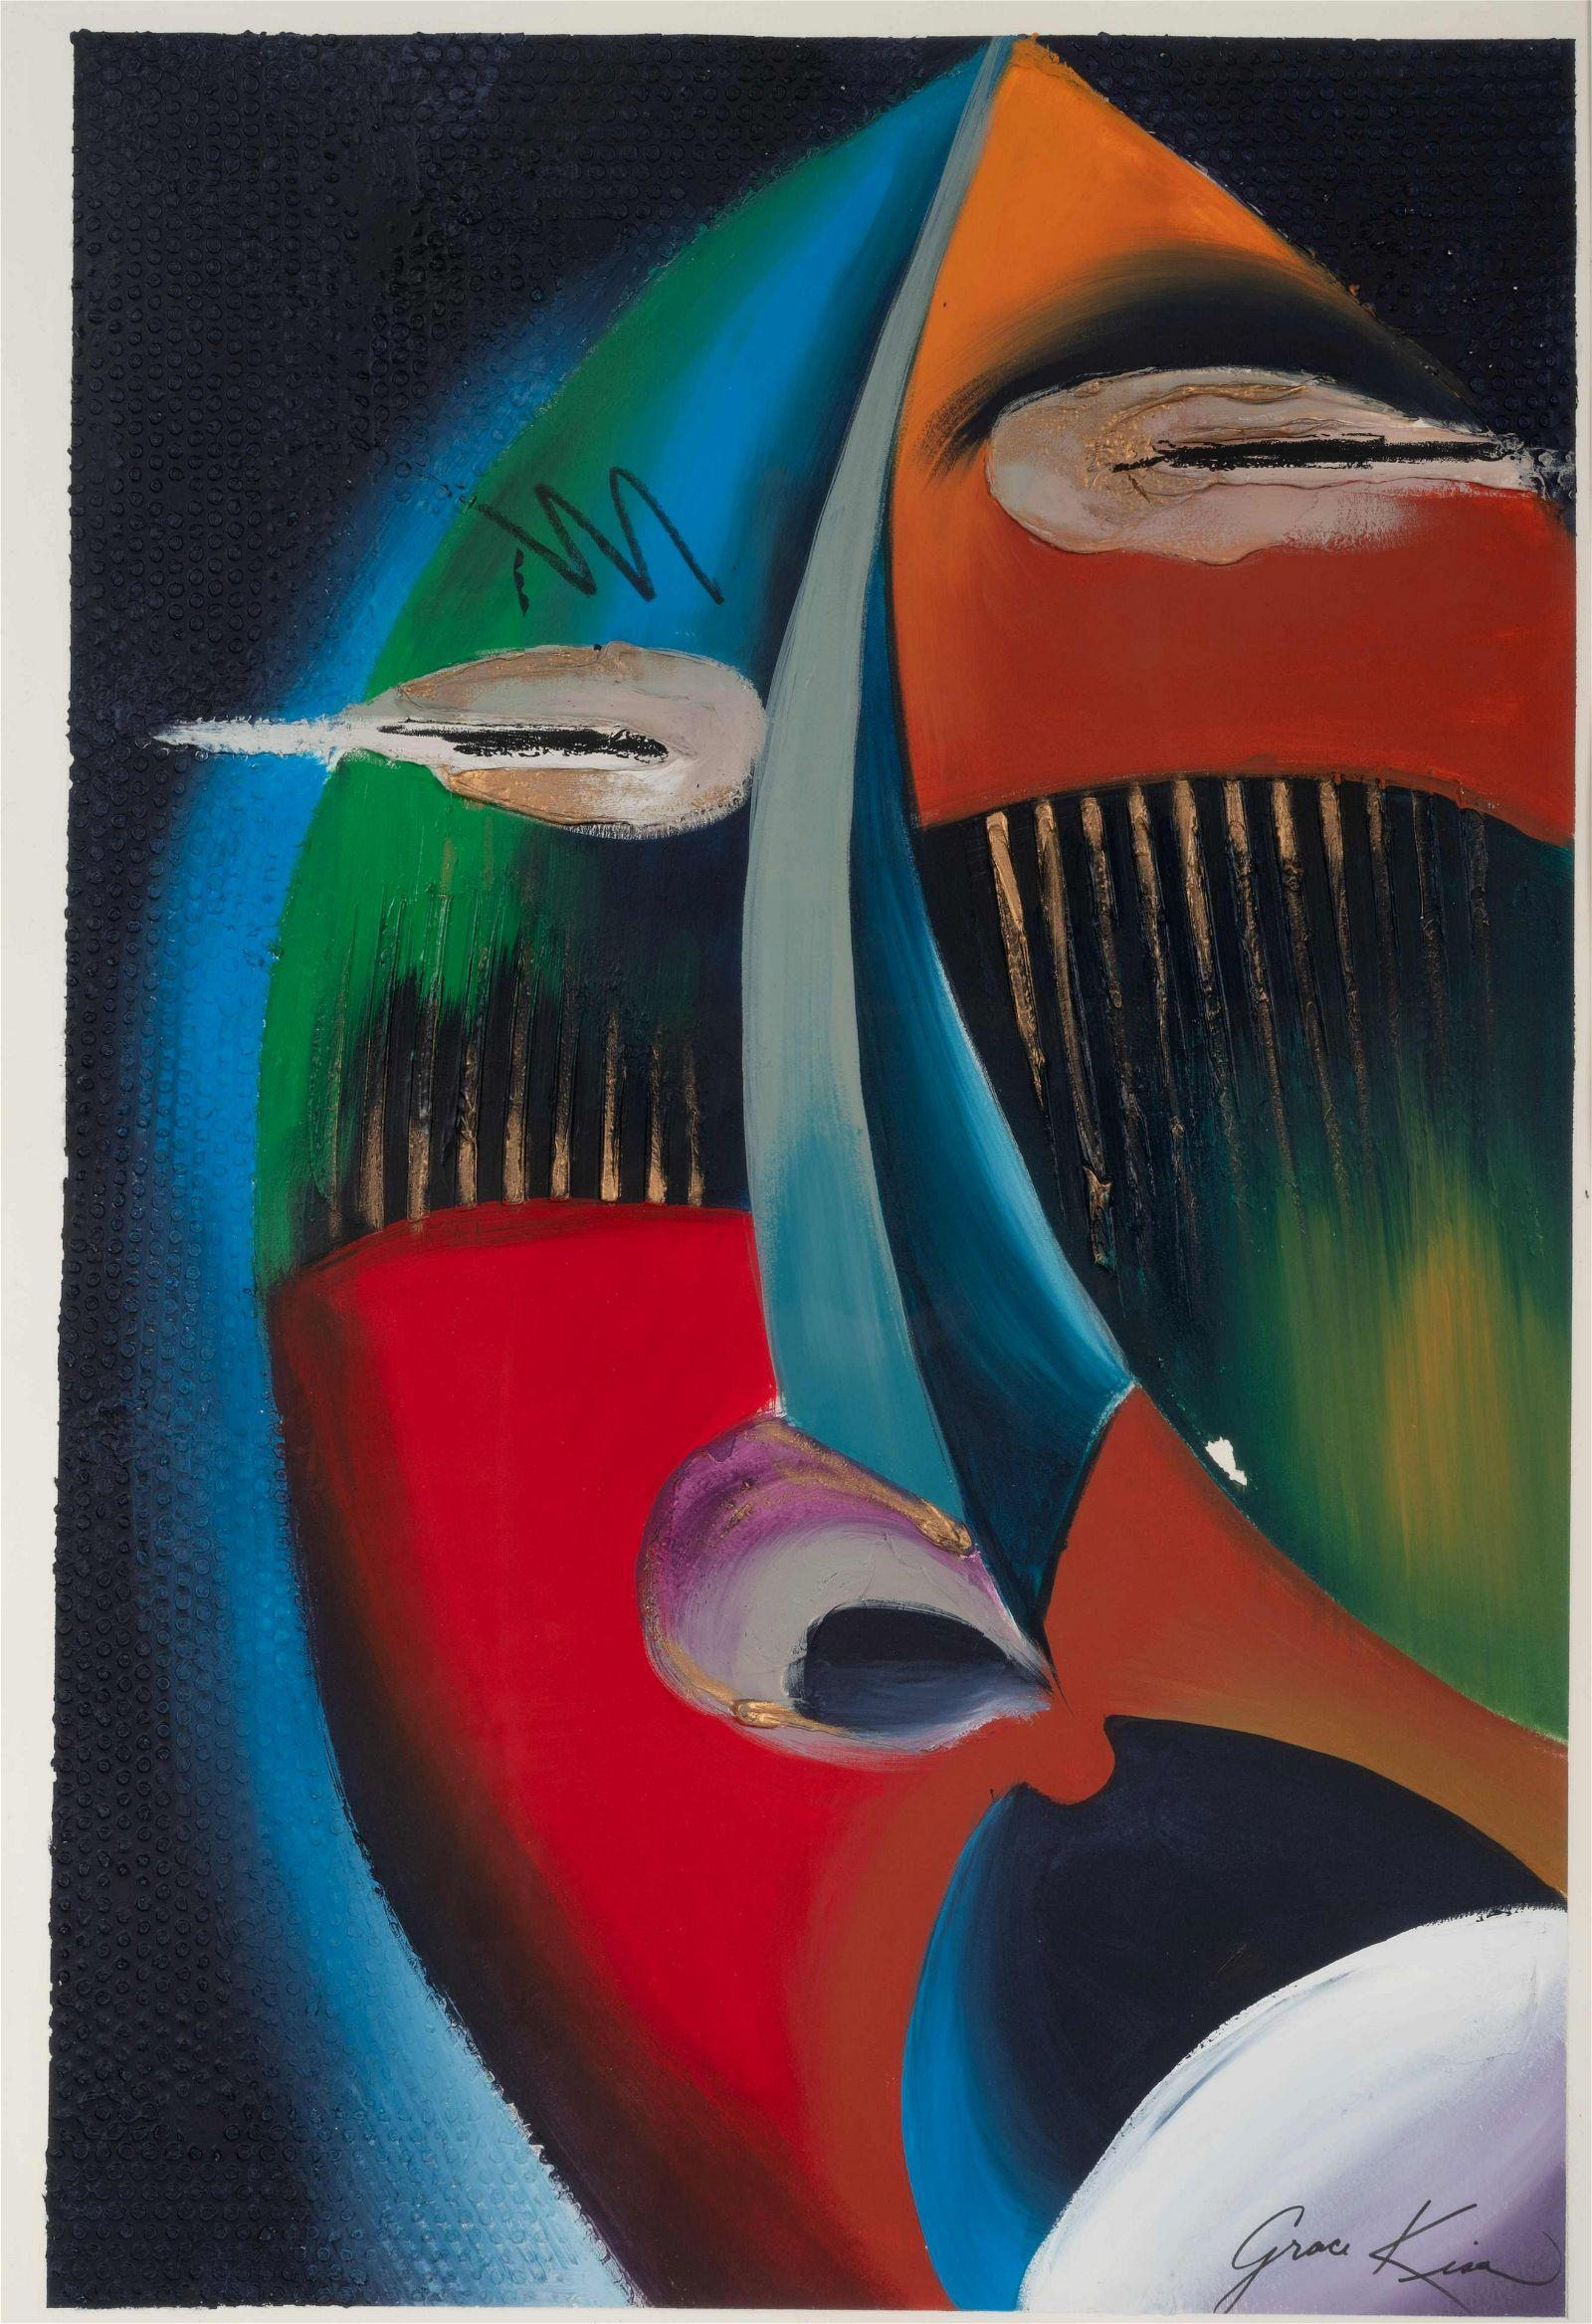 Grace Kisa (American, 20th century) Untitled